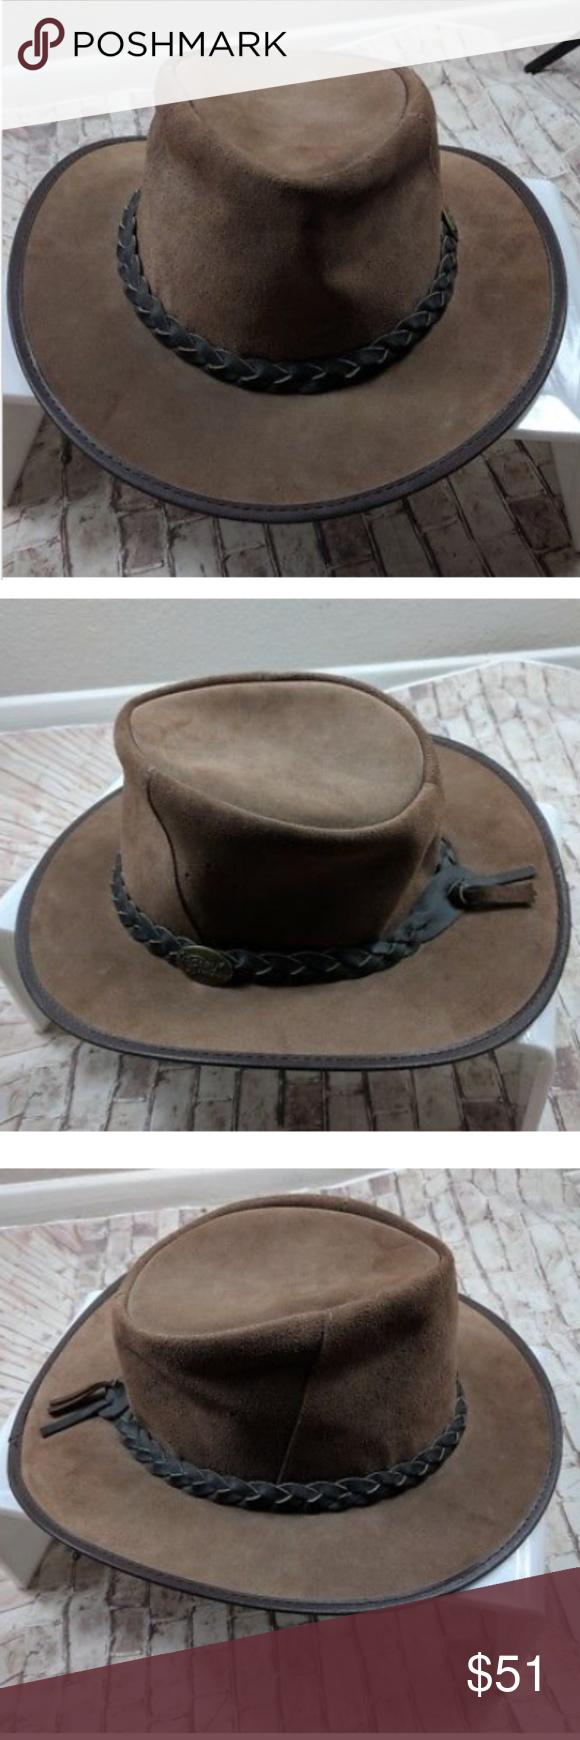 Jacaru Rare Men S Leather Bushman Australian Hat Australian Hat Leather Men Leather